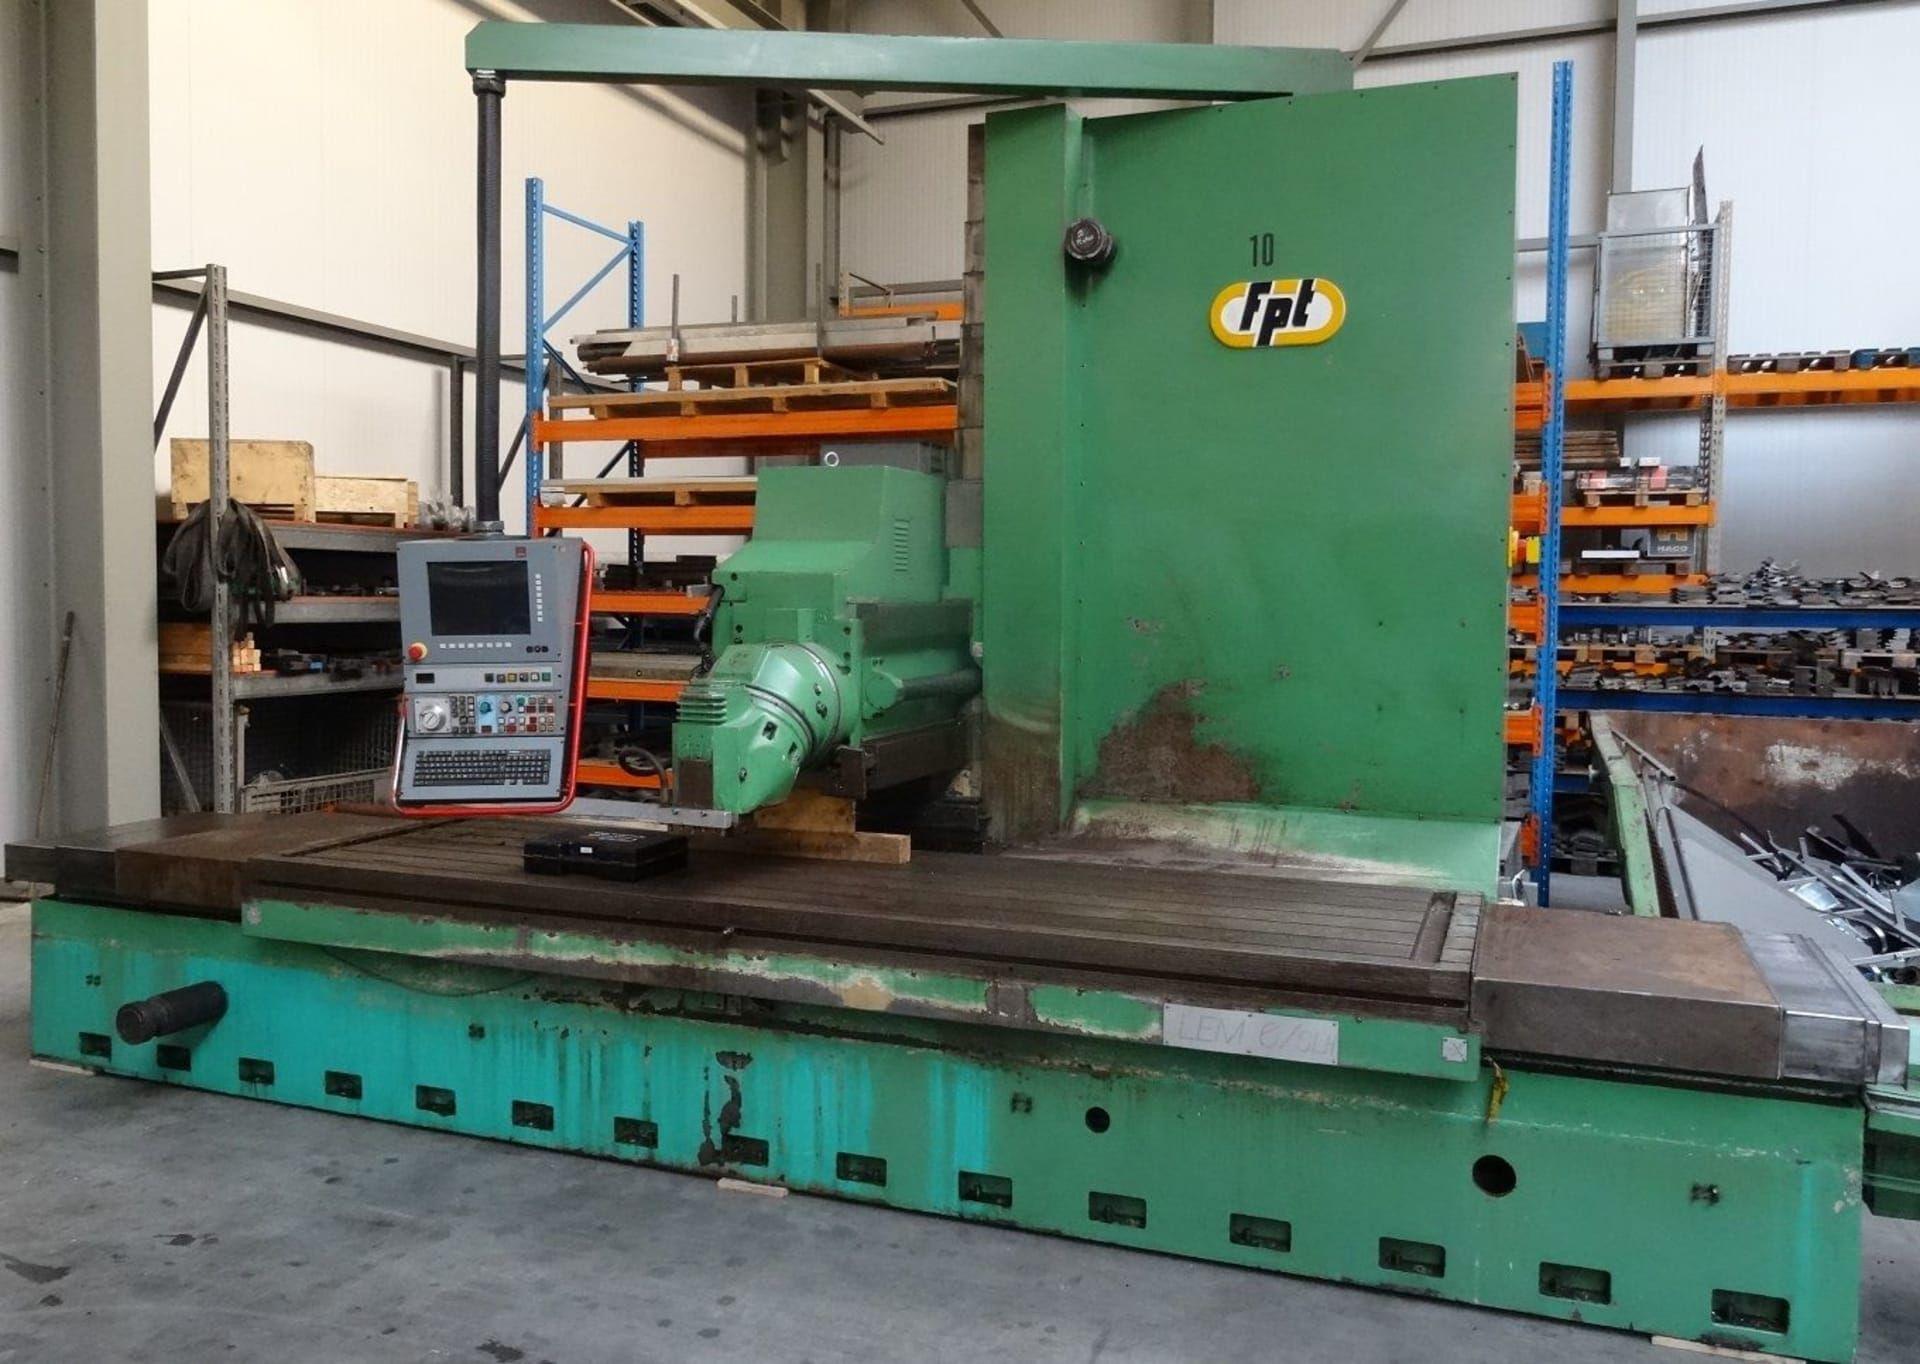 FPT LEM 6 SLH CNC CNC Fräsmaschine